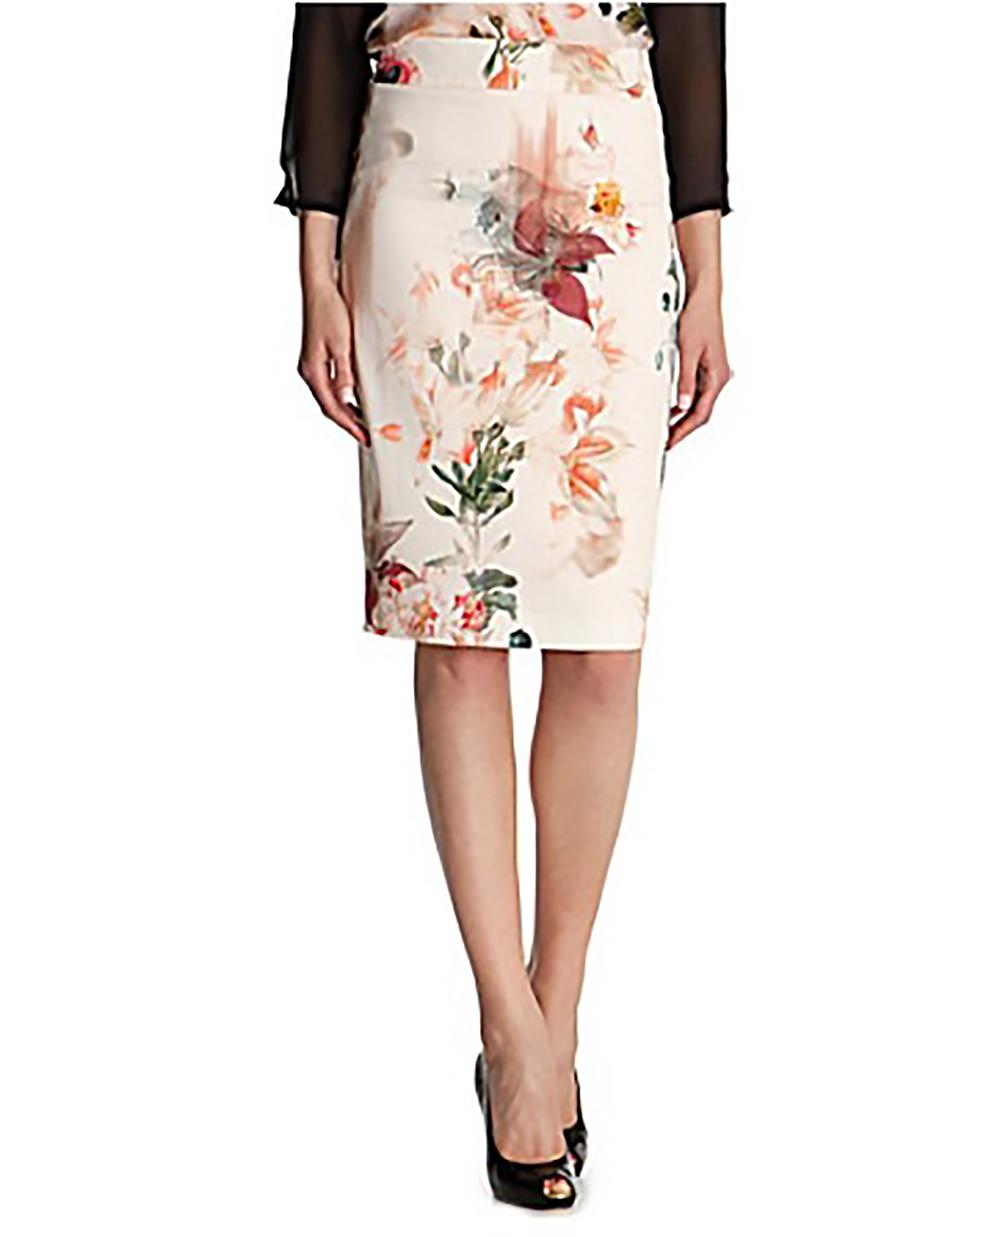 selfridges ted baker liliyah floral print pencil skirt 1500.jpg